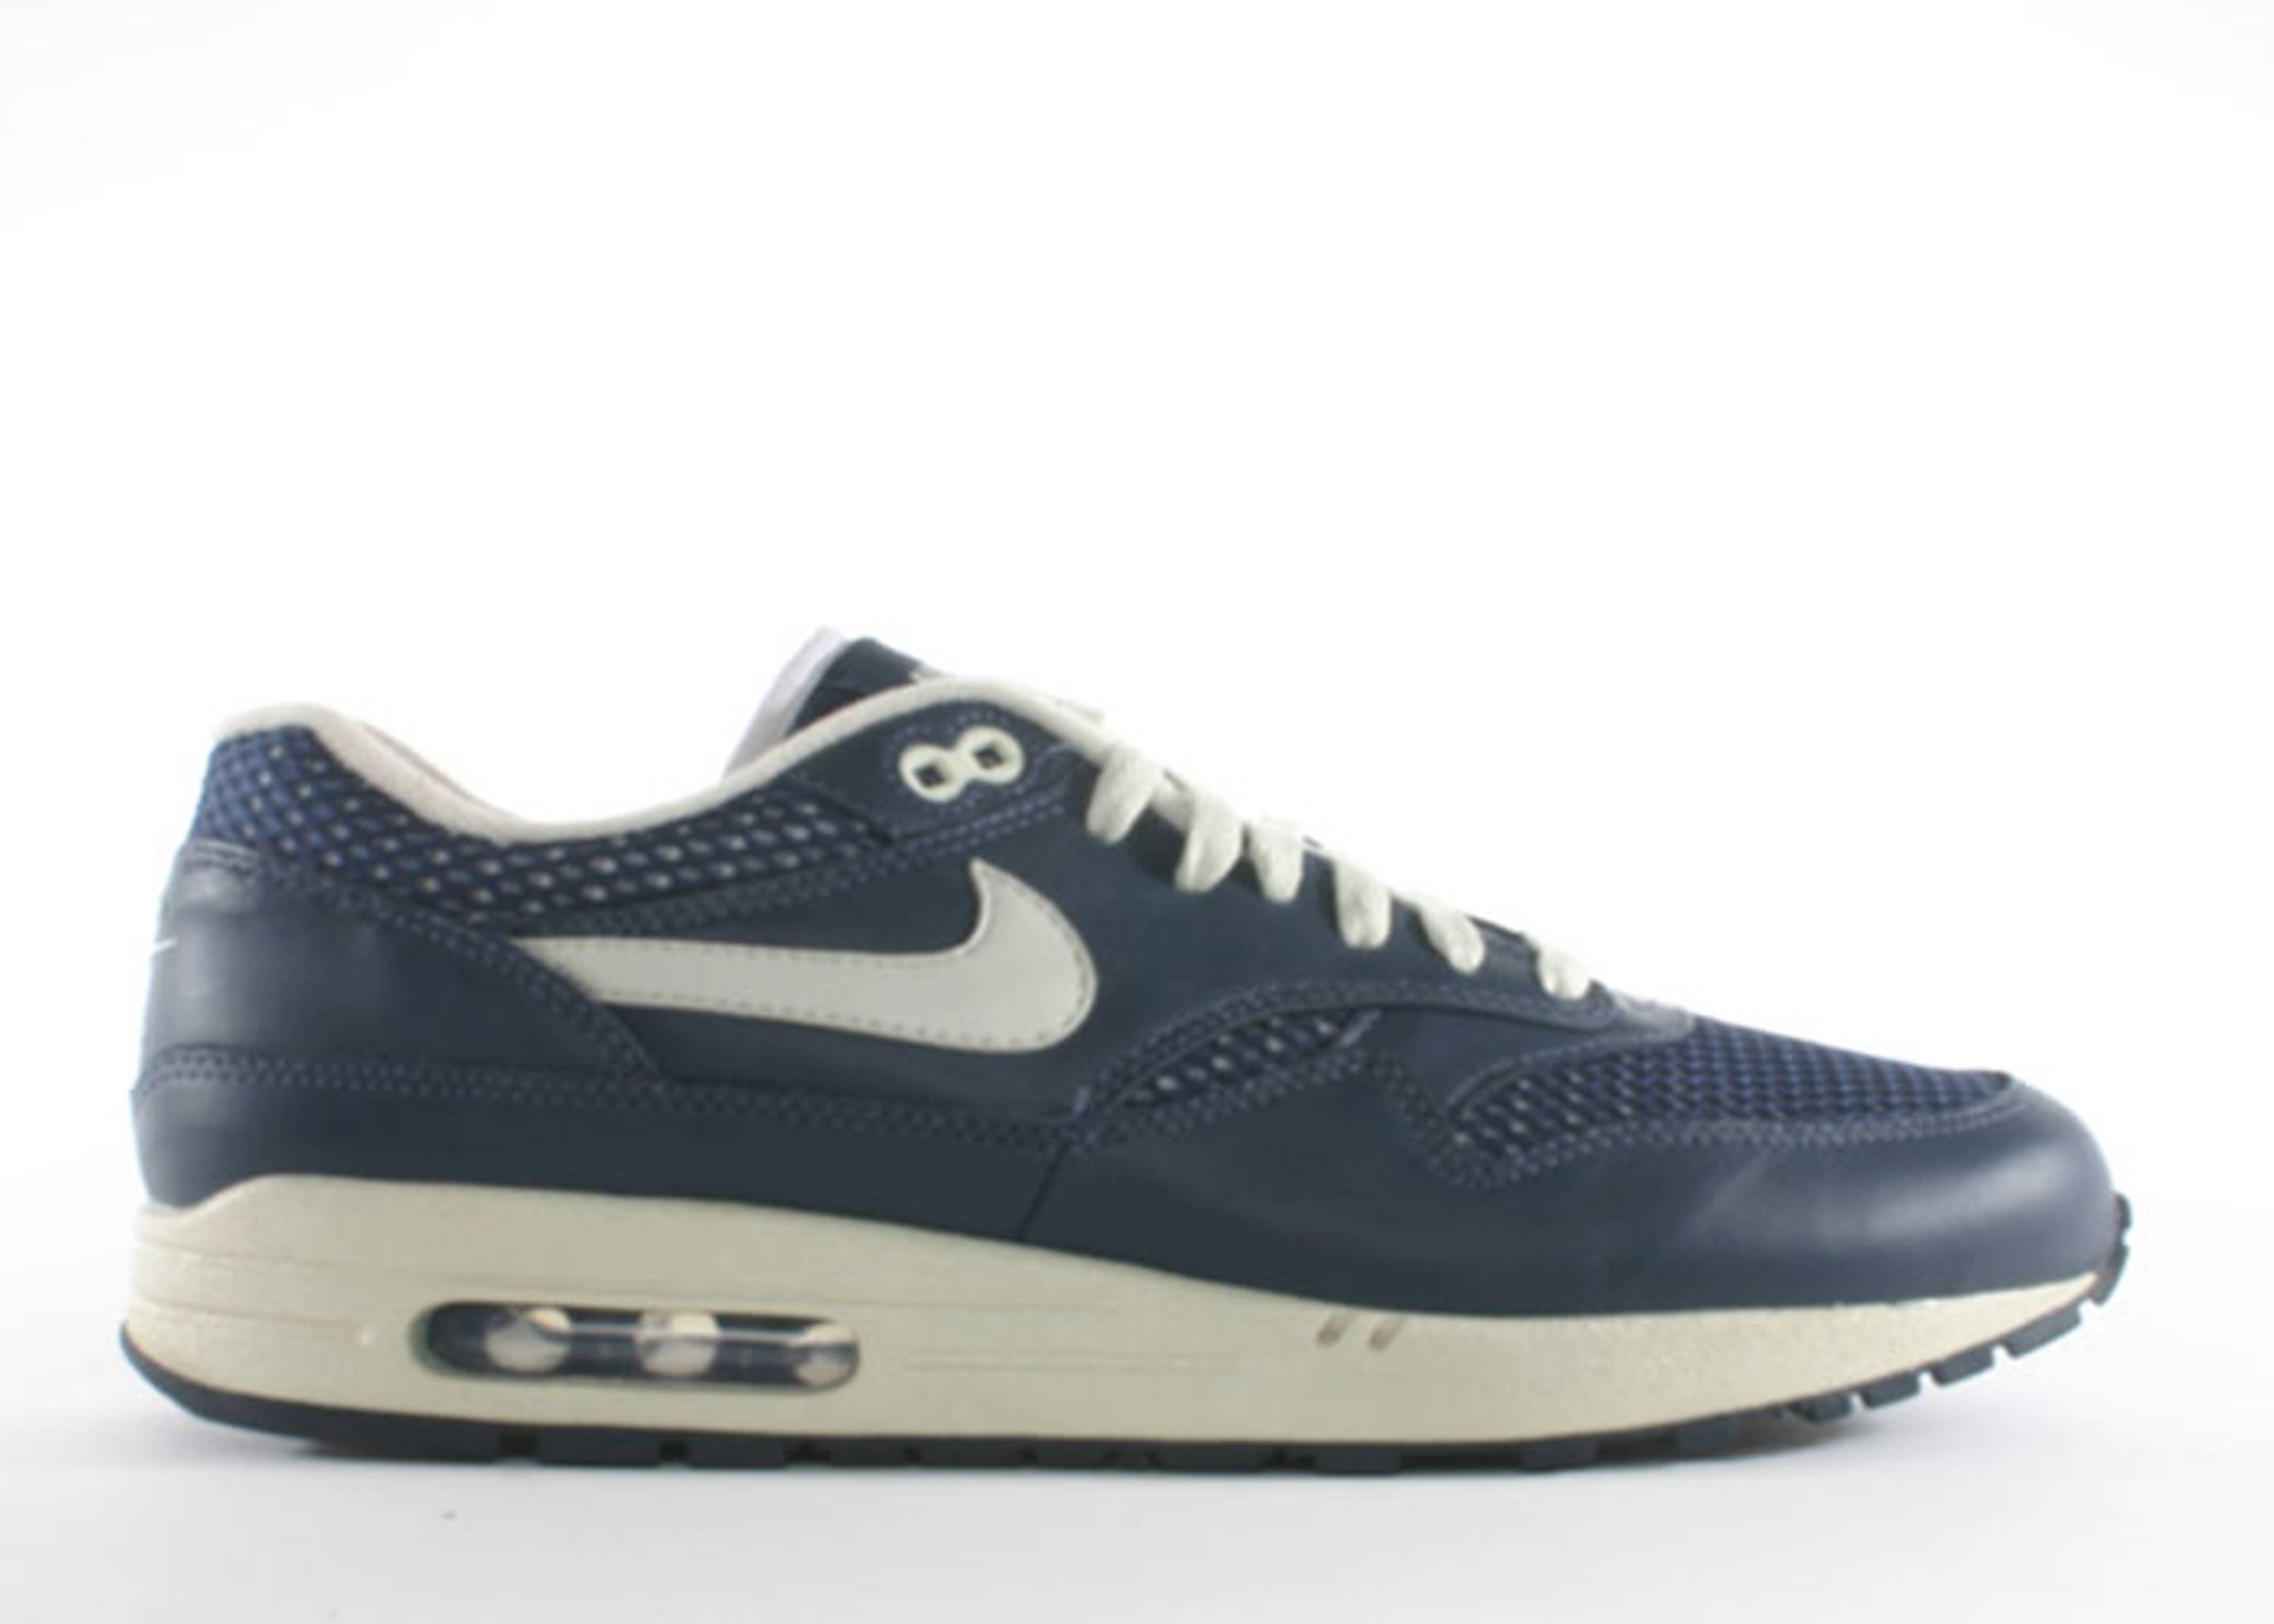 Nike Air Max 95 Premium Light Redwood Obsidian SneakerFiles  SneakerFiles